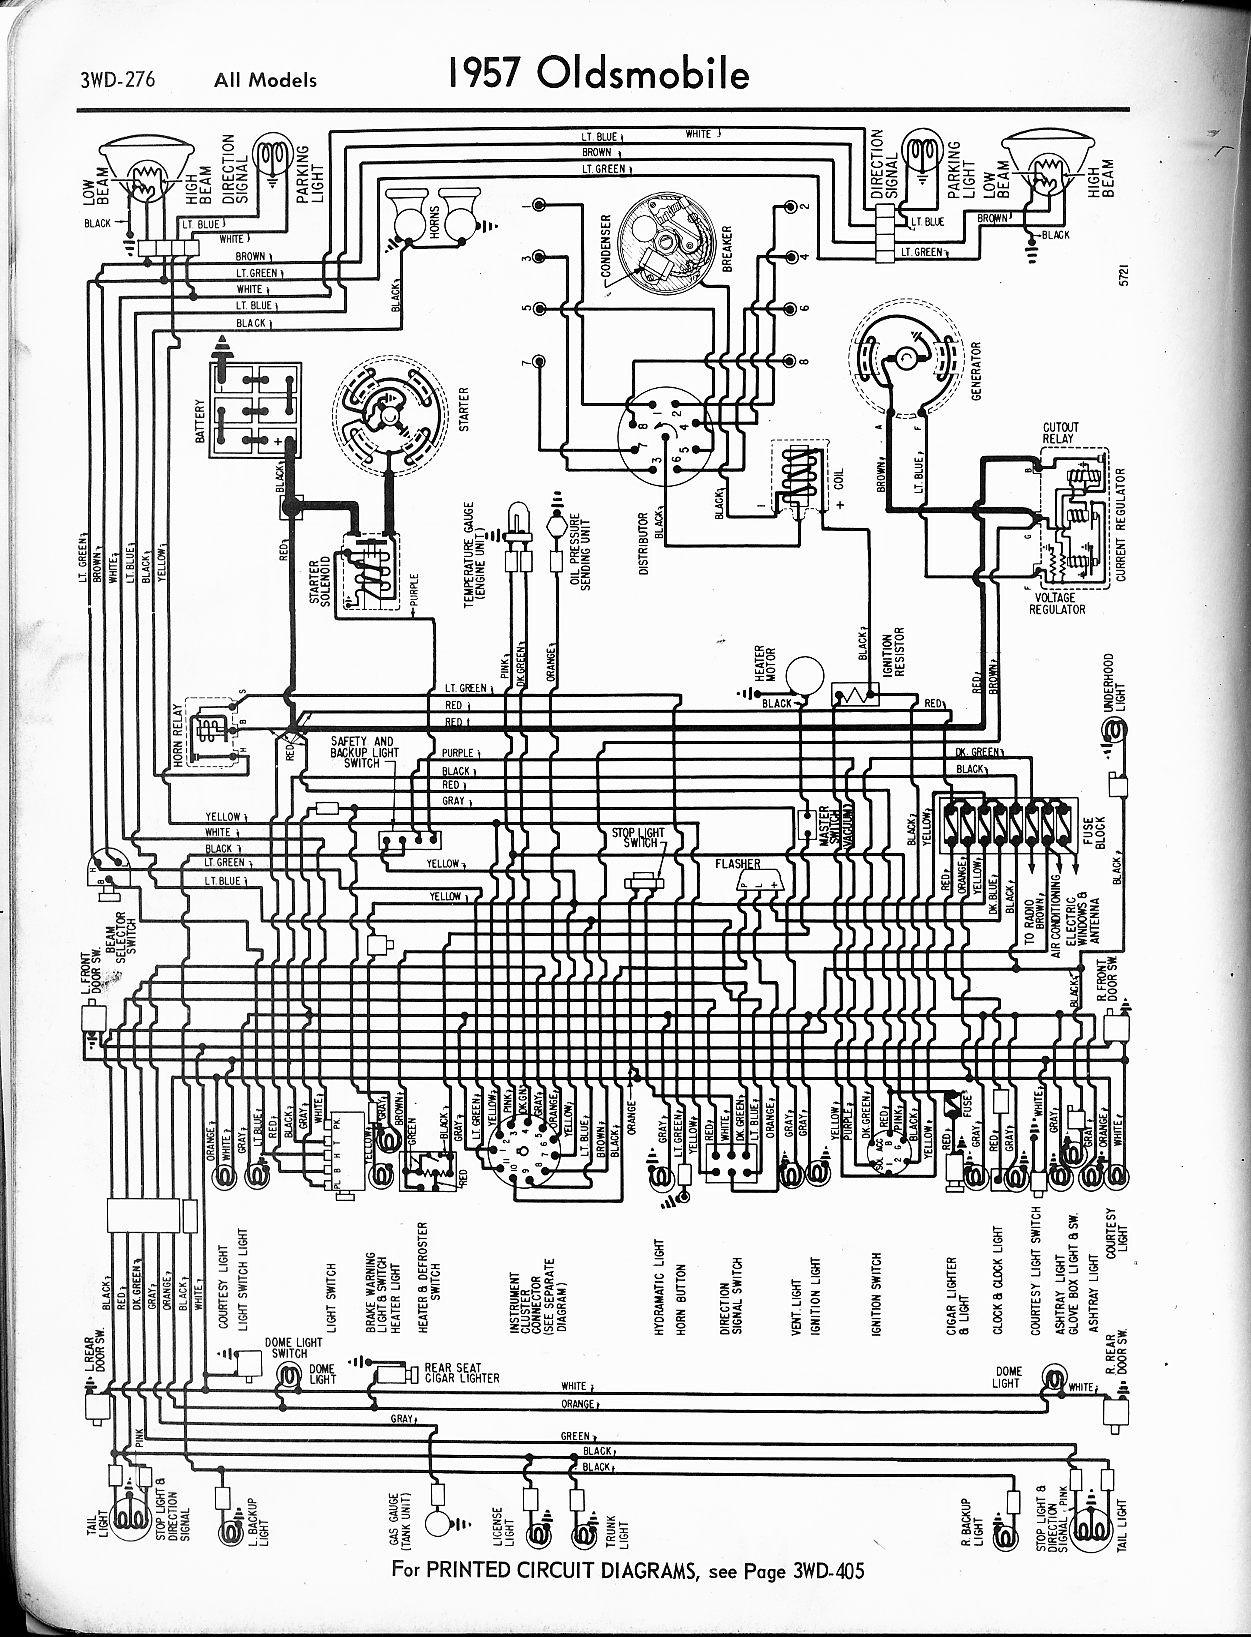 Car Heater Blower Motor Wiring Diagram Ninety Eight Wiring Diagram Get Free Image About Wiring Diagram Of Car Heater Blower Motor Wiring Diagram